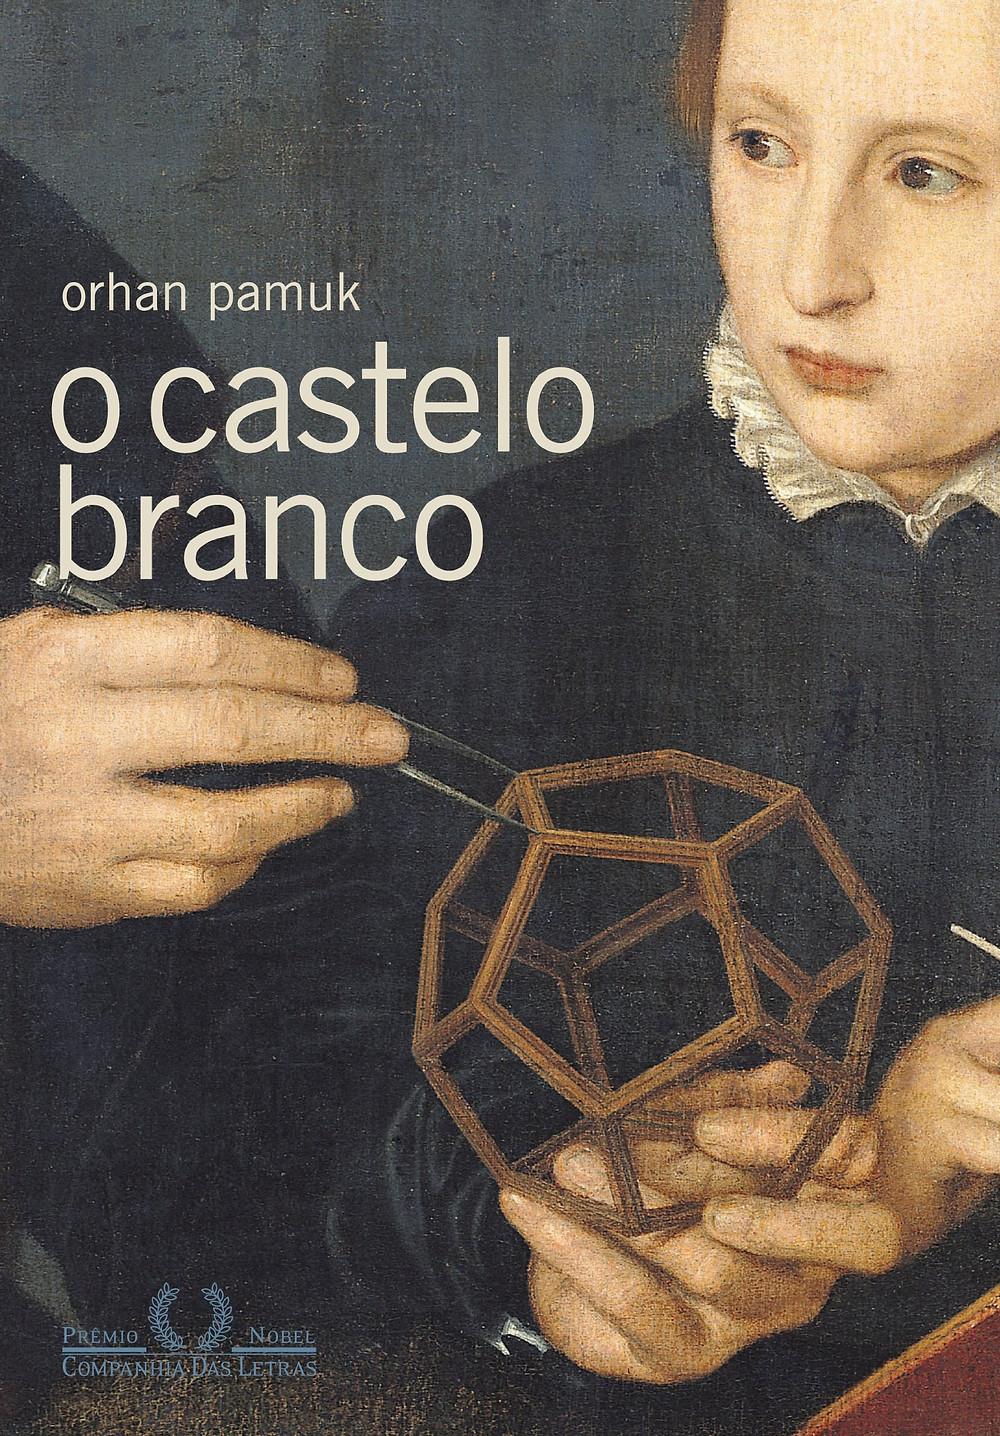 O Castelo Branco é o romance de Orhan Pamuk